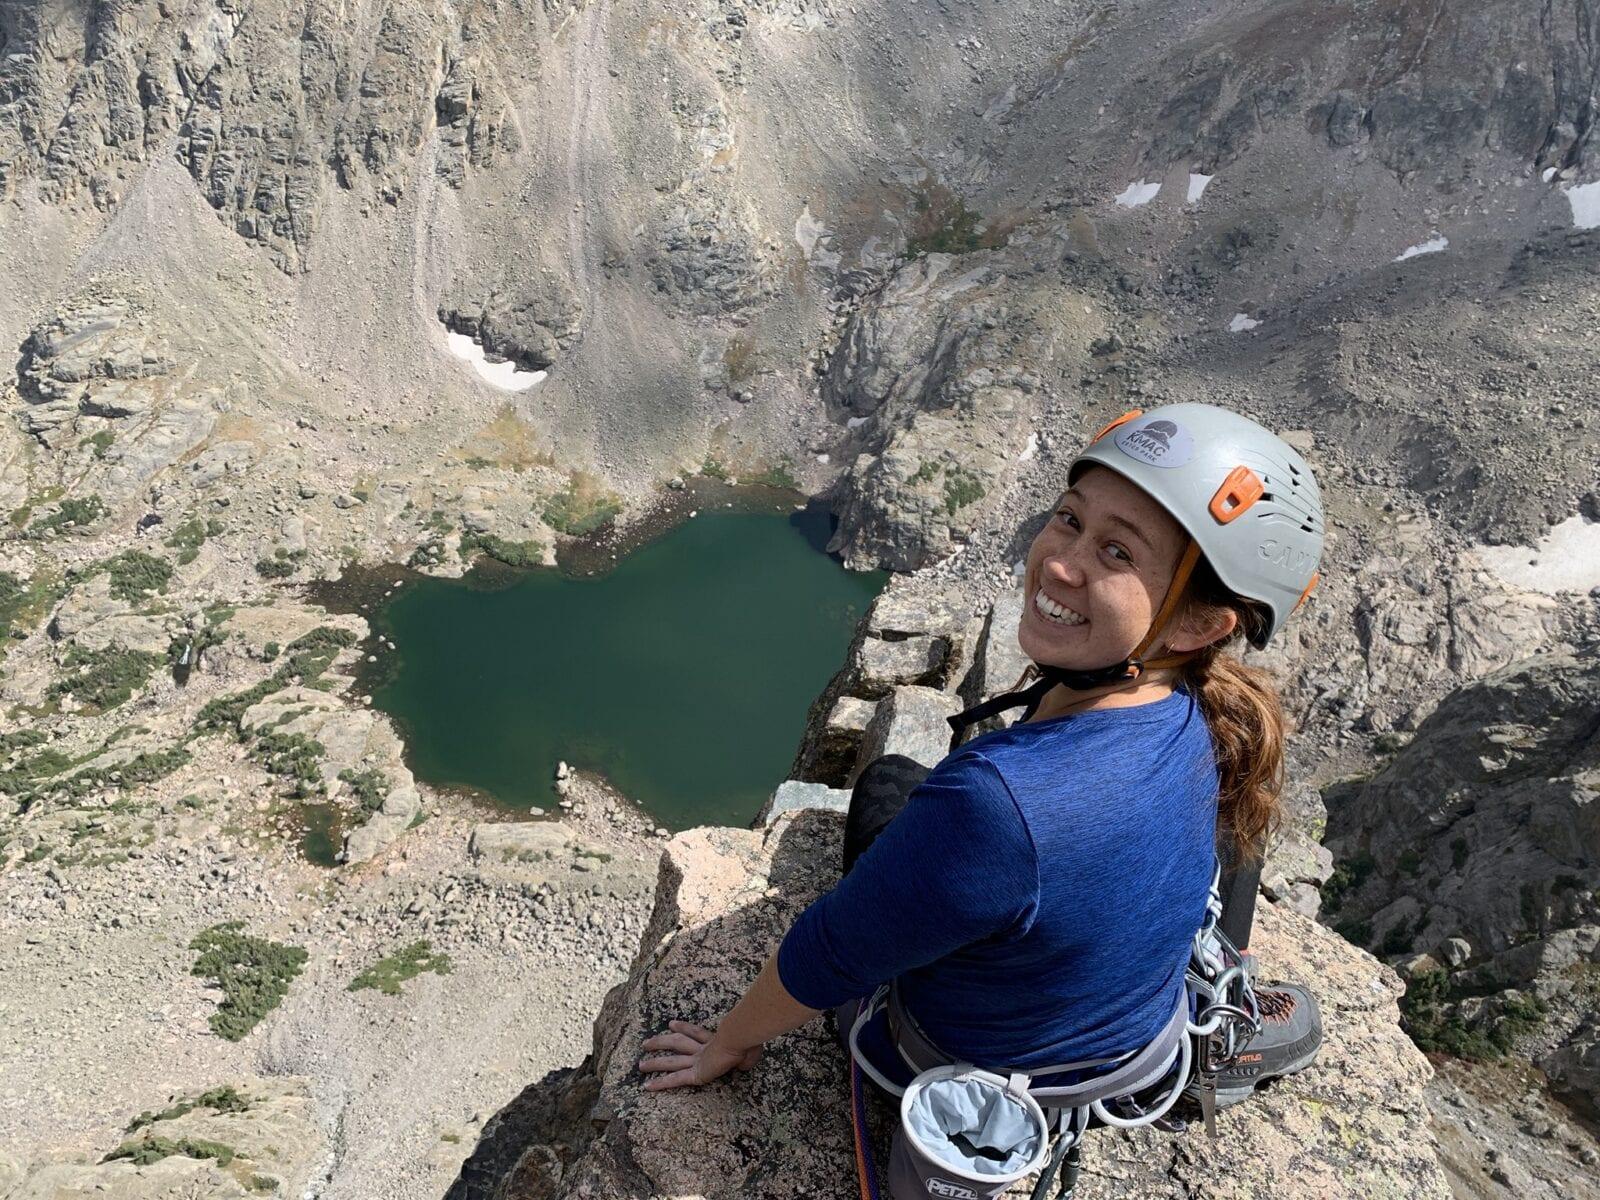 Image of a woman on the Via Ferrata at at Kent Mountain Adventure Center in Estes Park, Colorado